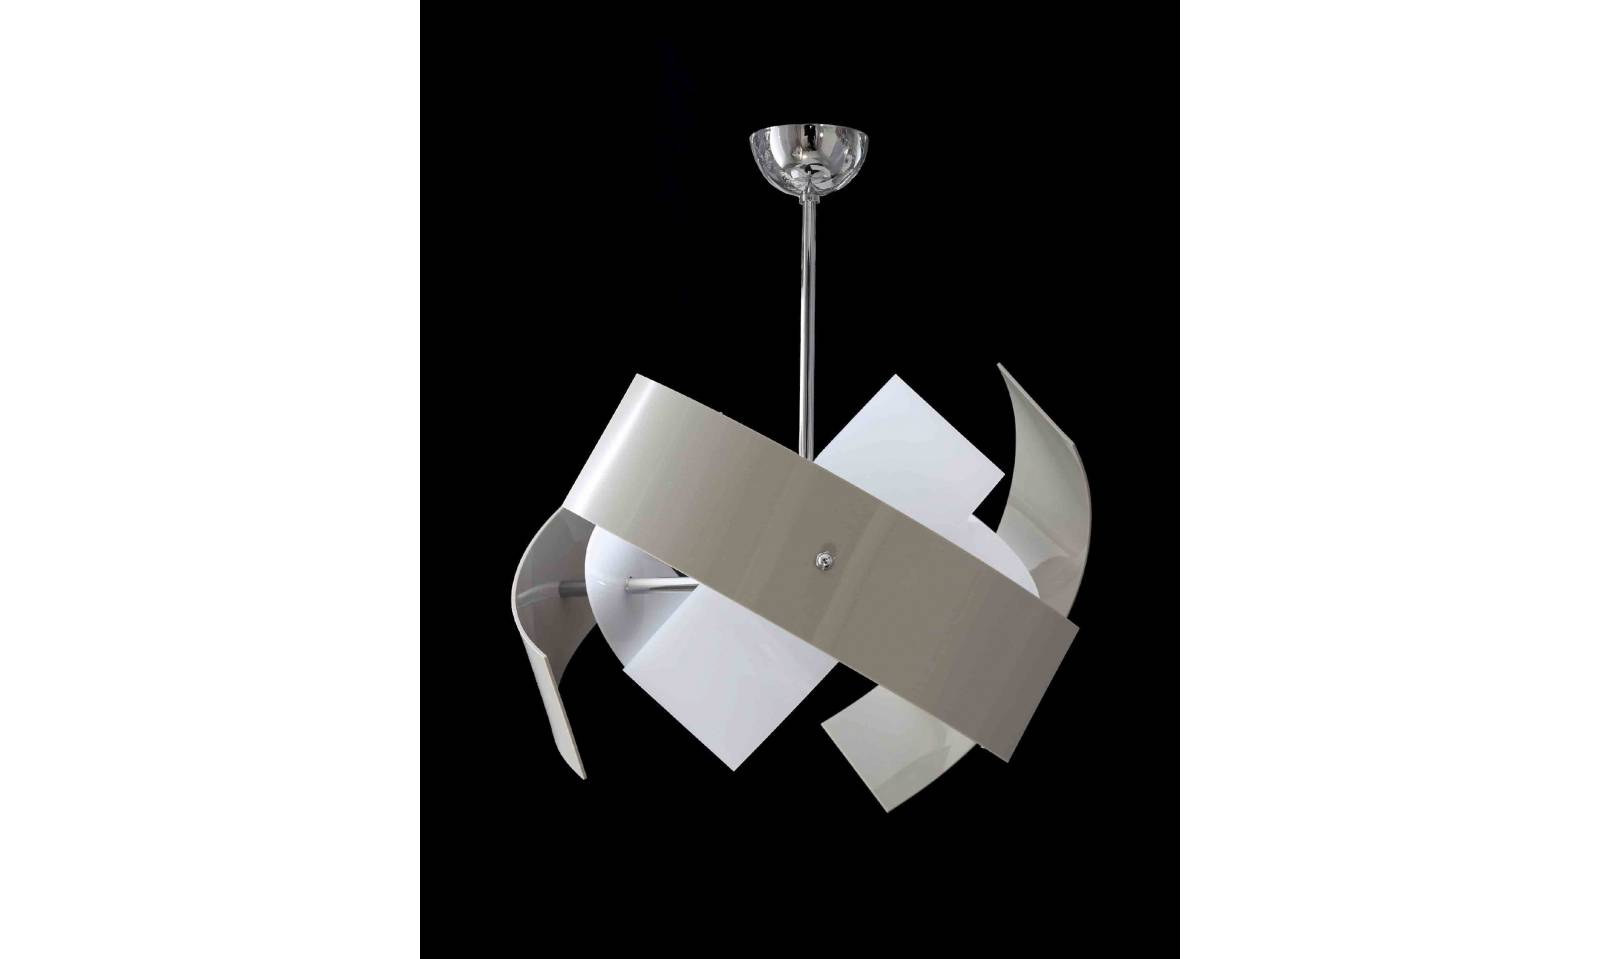 Lampadari Di Carta On Line : Lampadari in plexiglass lampada a sospensione moderna